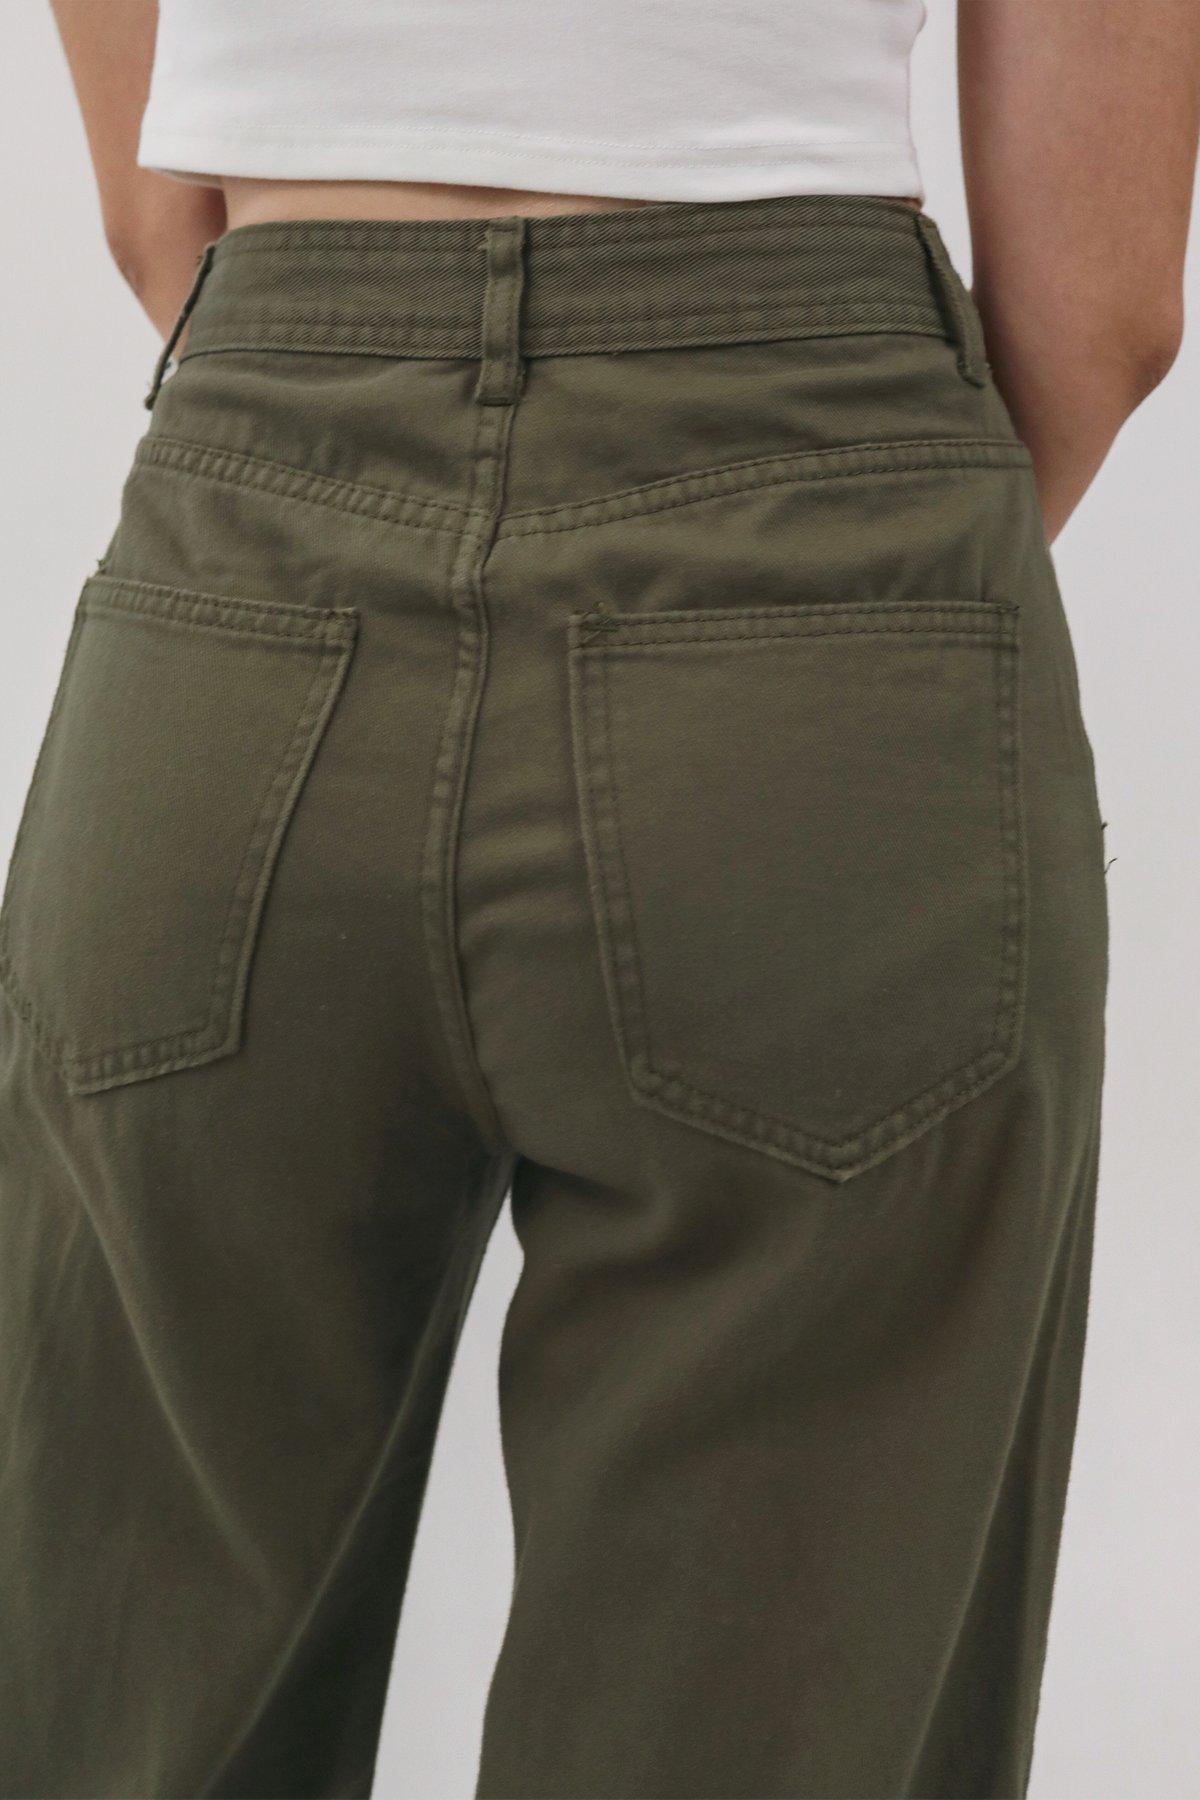 Newton Straight Leg Jeans (Olive)